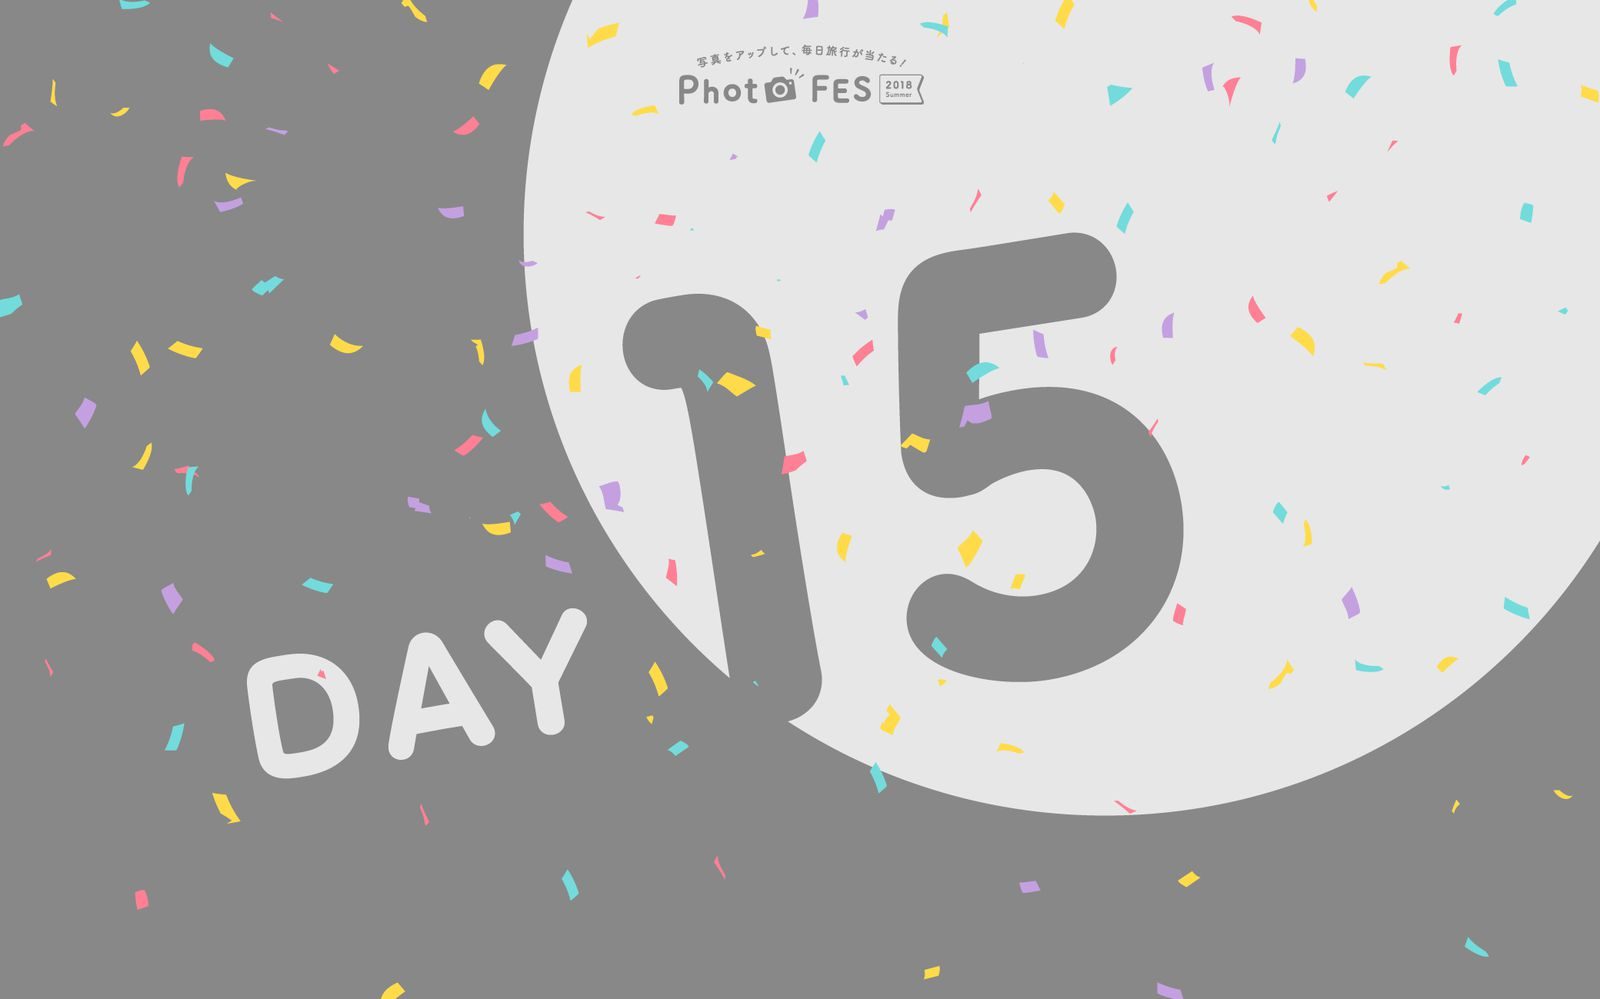 【DAY15】「Photo FES 2018」7月10日投稿分であたる賞品&受賞者発表